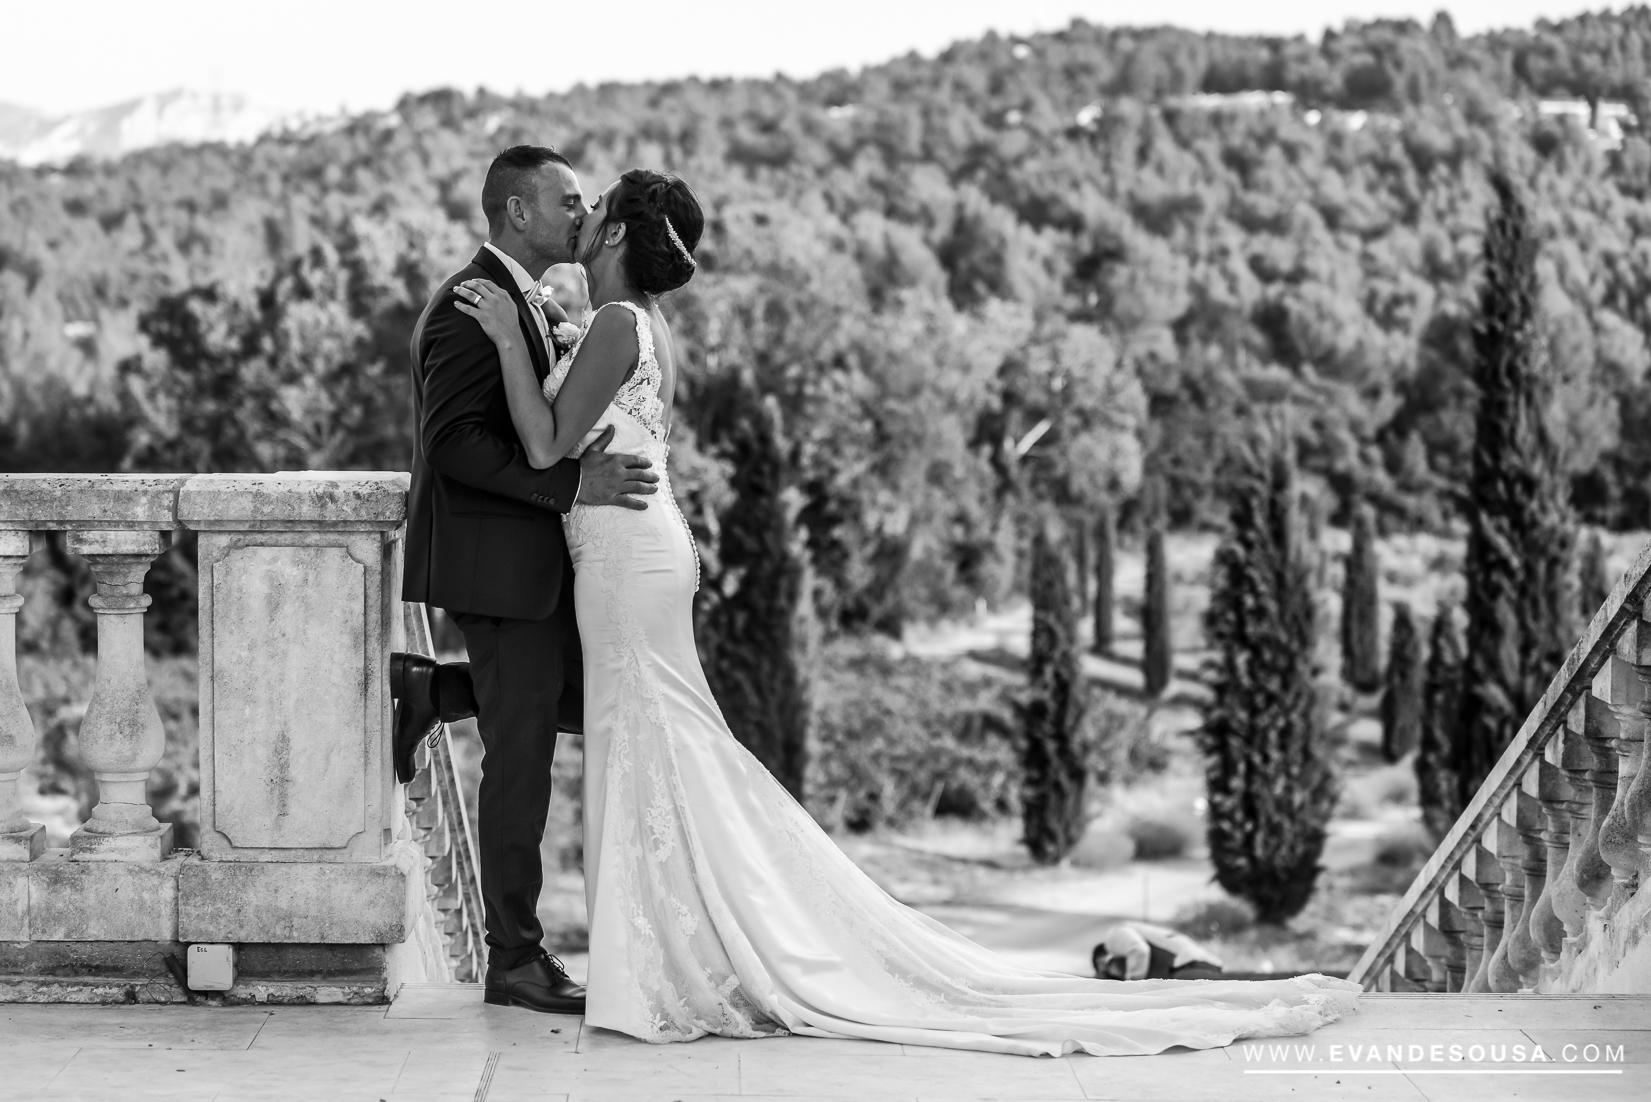 Photographe De Mariage - Evan De Sousa Cassis - Marseille - Aix En Provence - Toulon - Nimes - Bandol